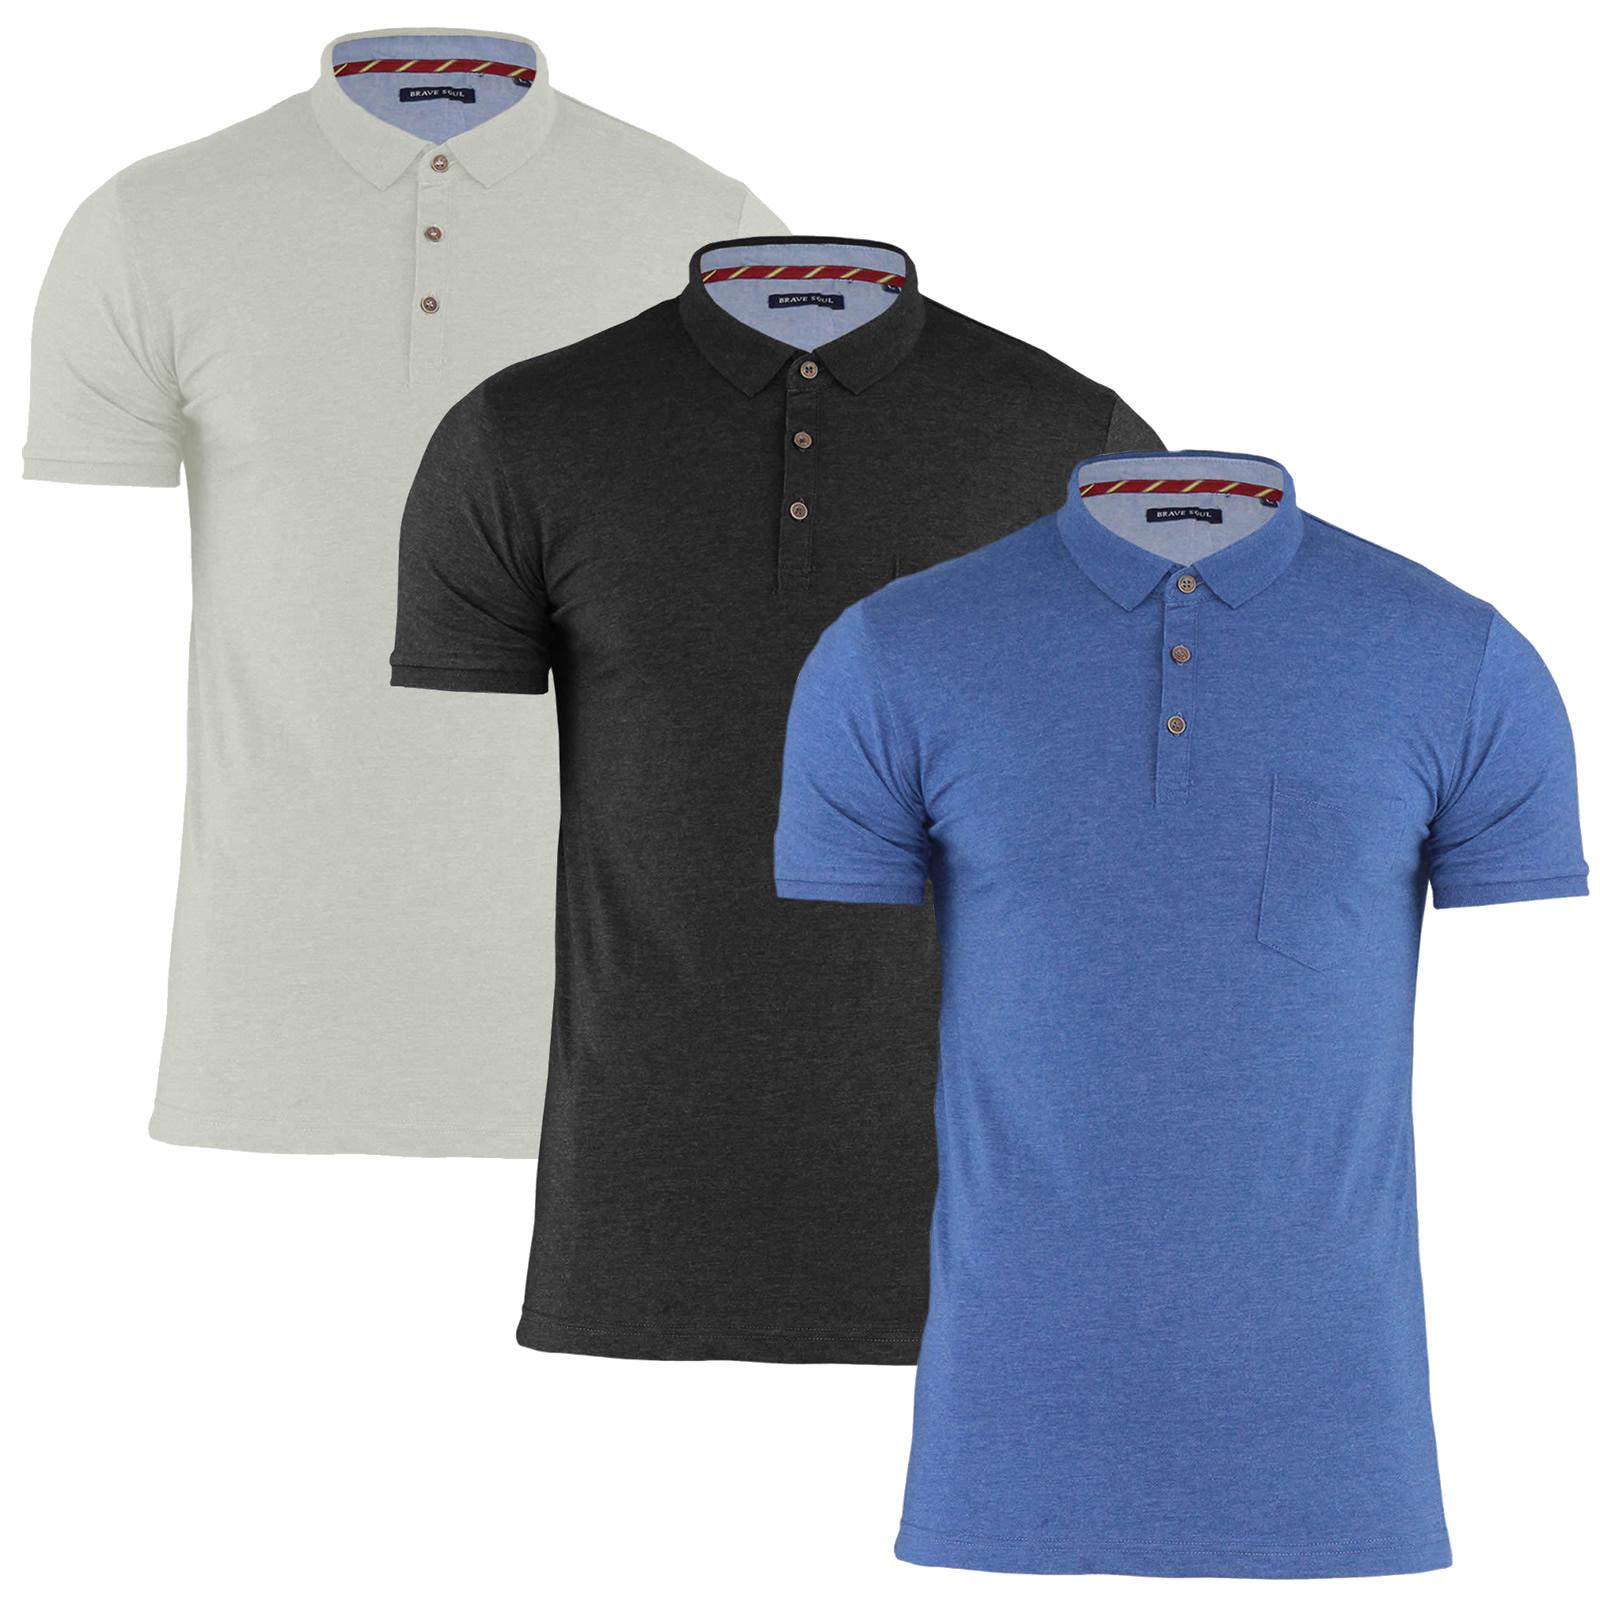 Mens Polo Shirt by Designer Brave Soul Pique Cotton Short Sleeved T-Shirt S-XL